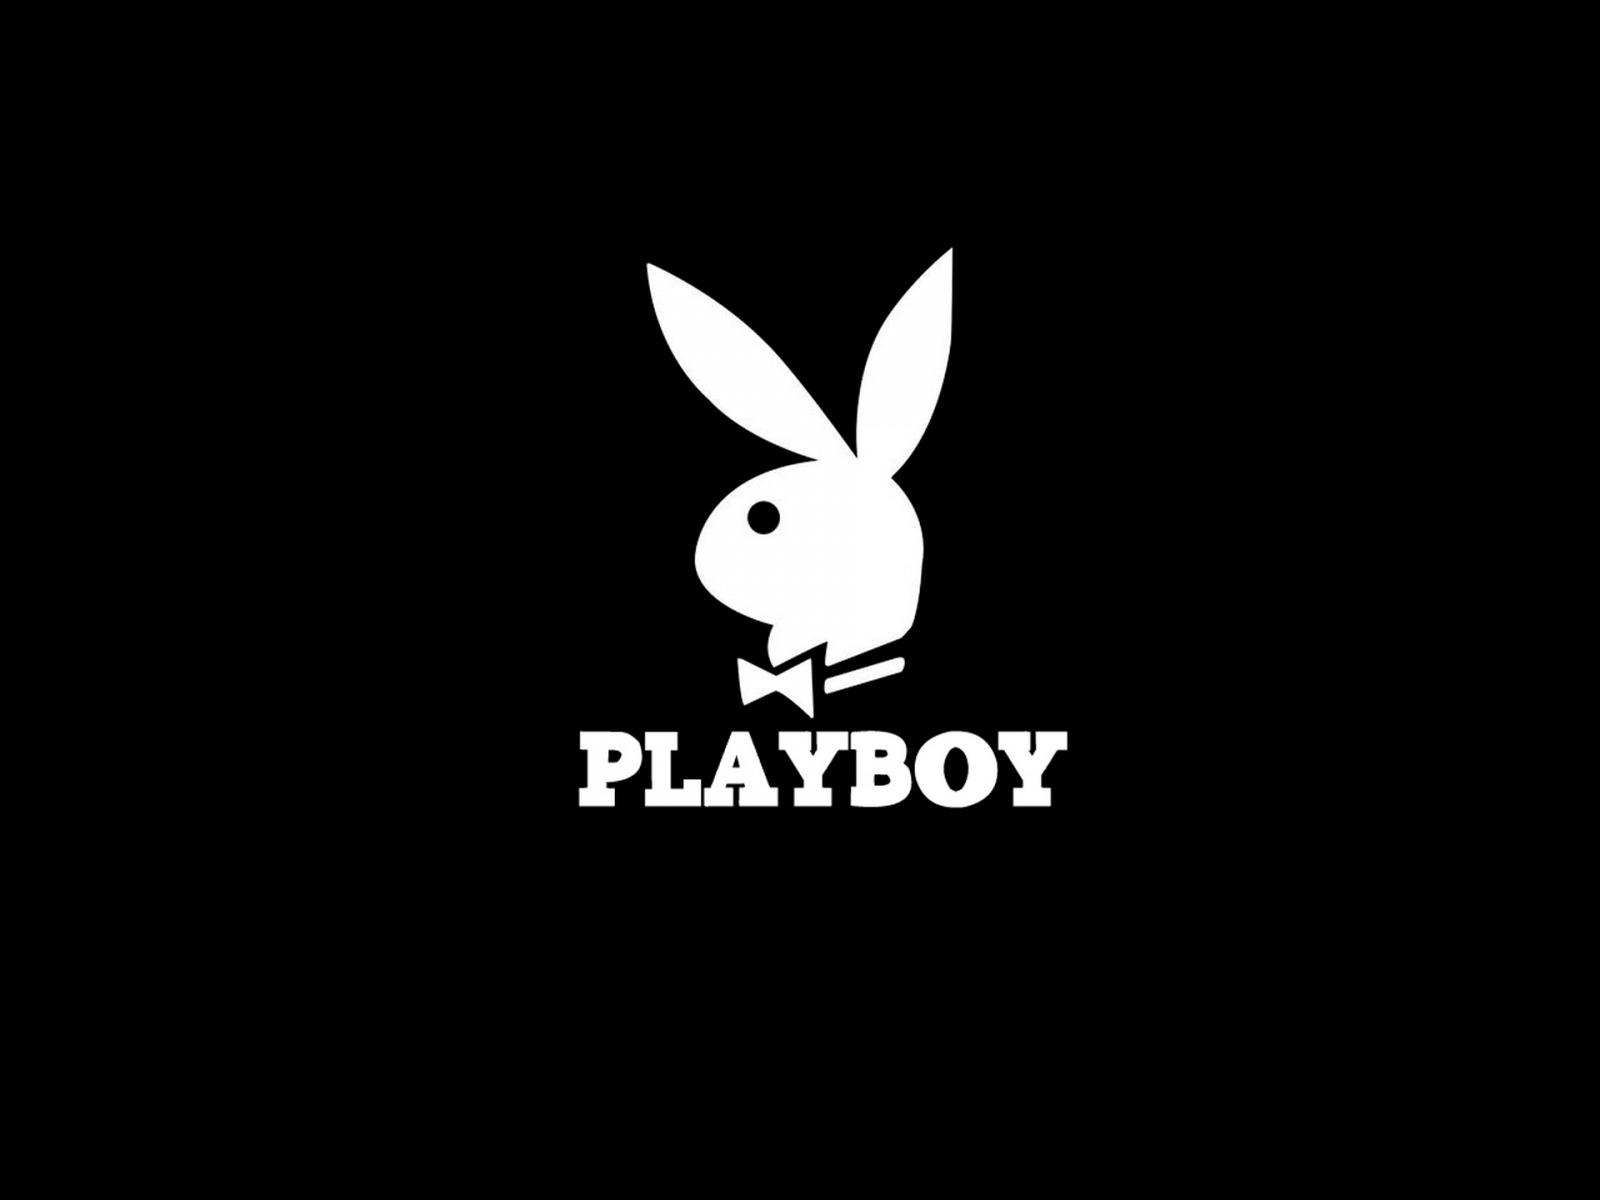 Playboy Logo Wallpaper Brands Other Wallpapers In Jpg Format